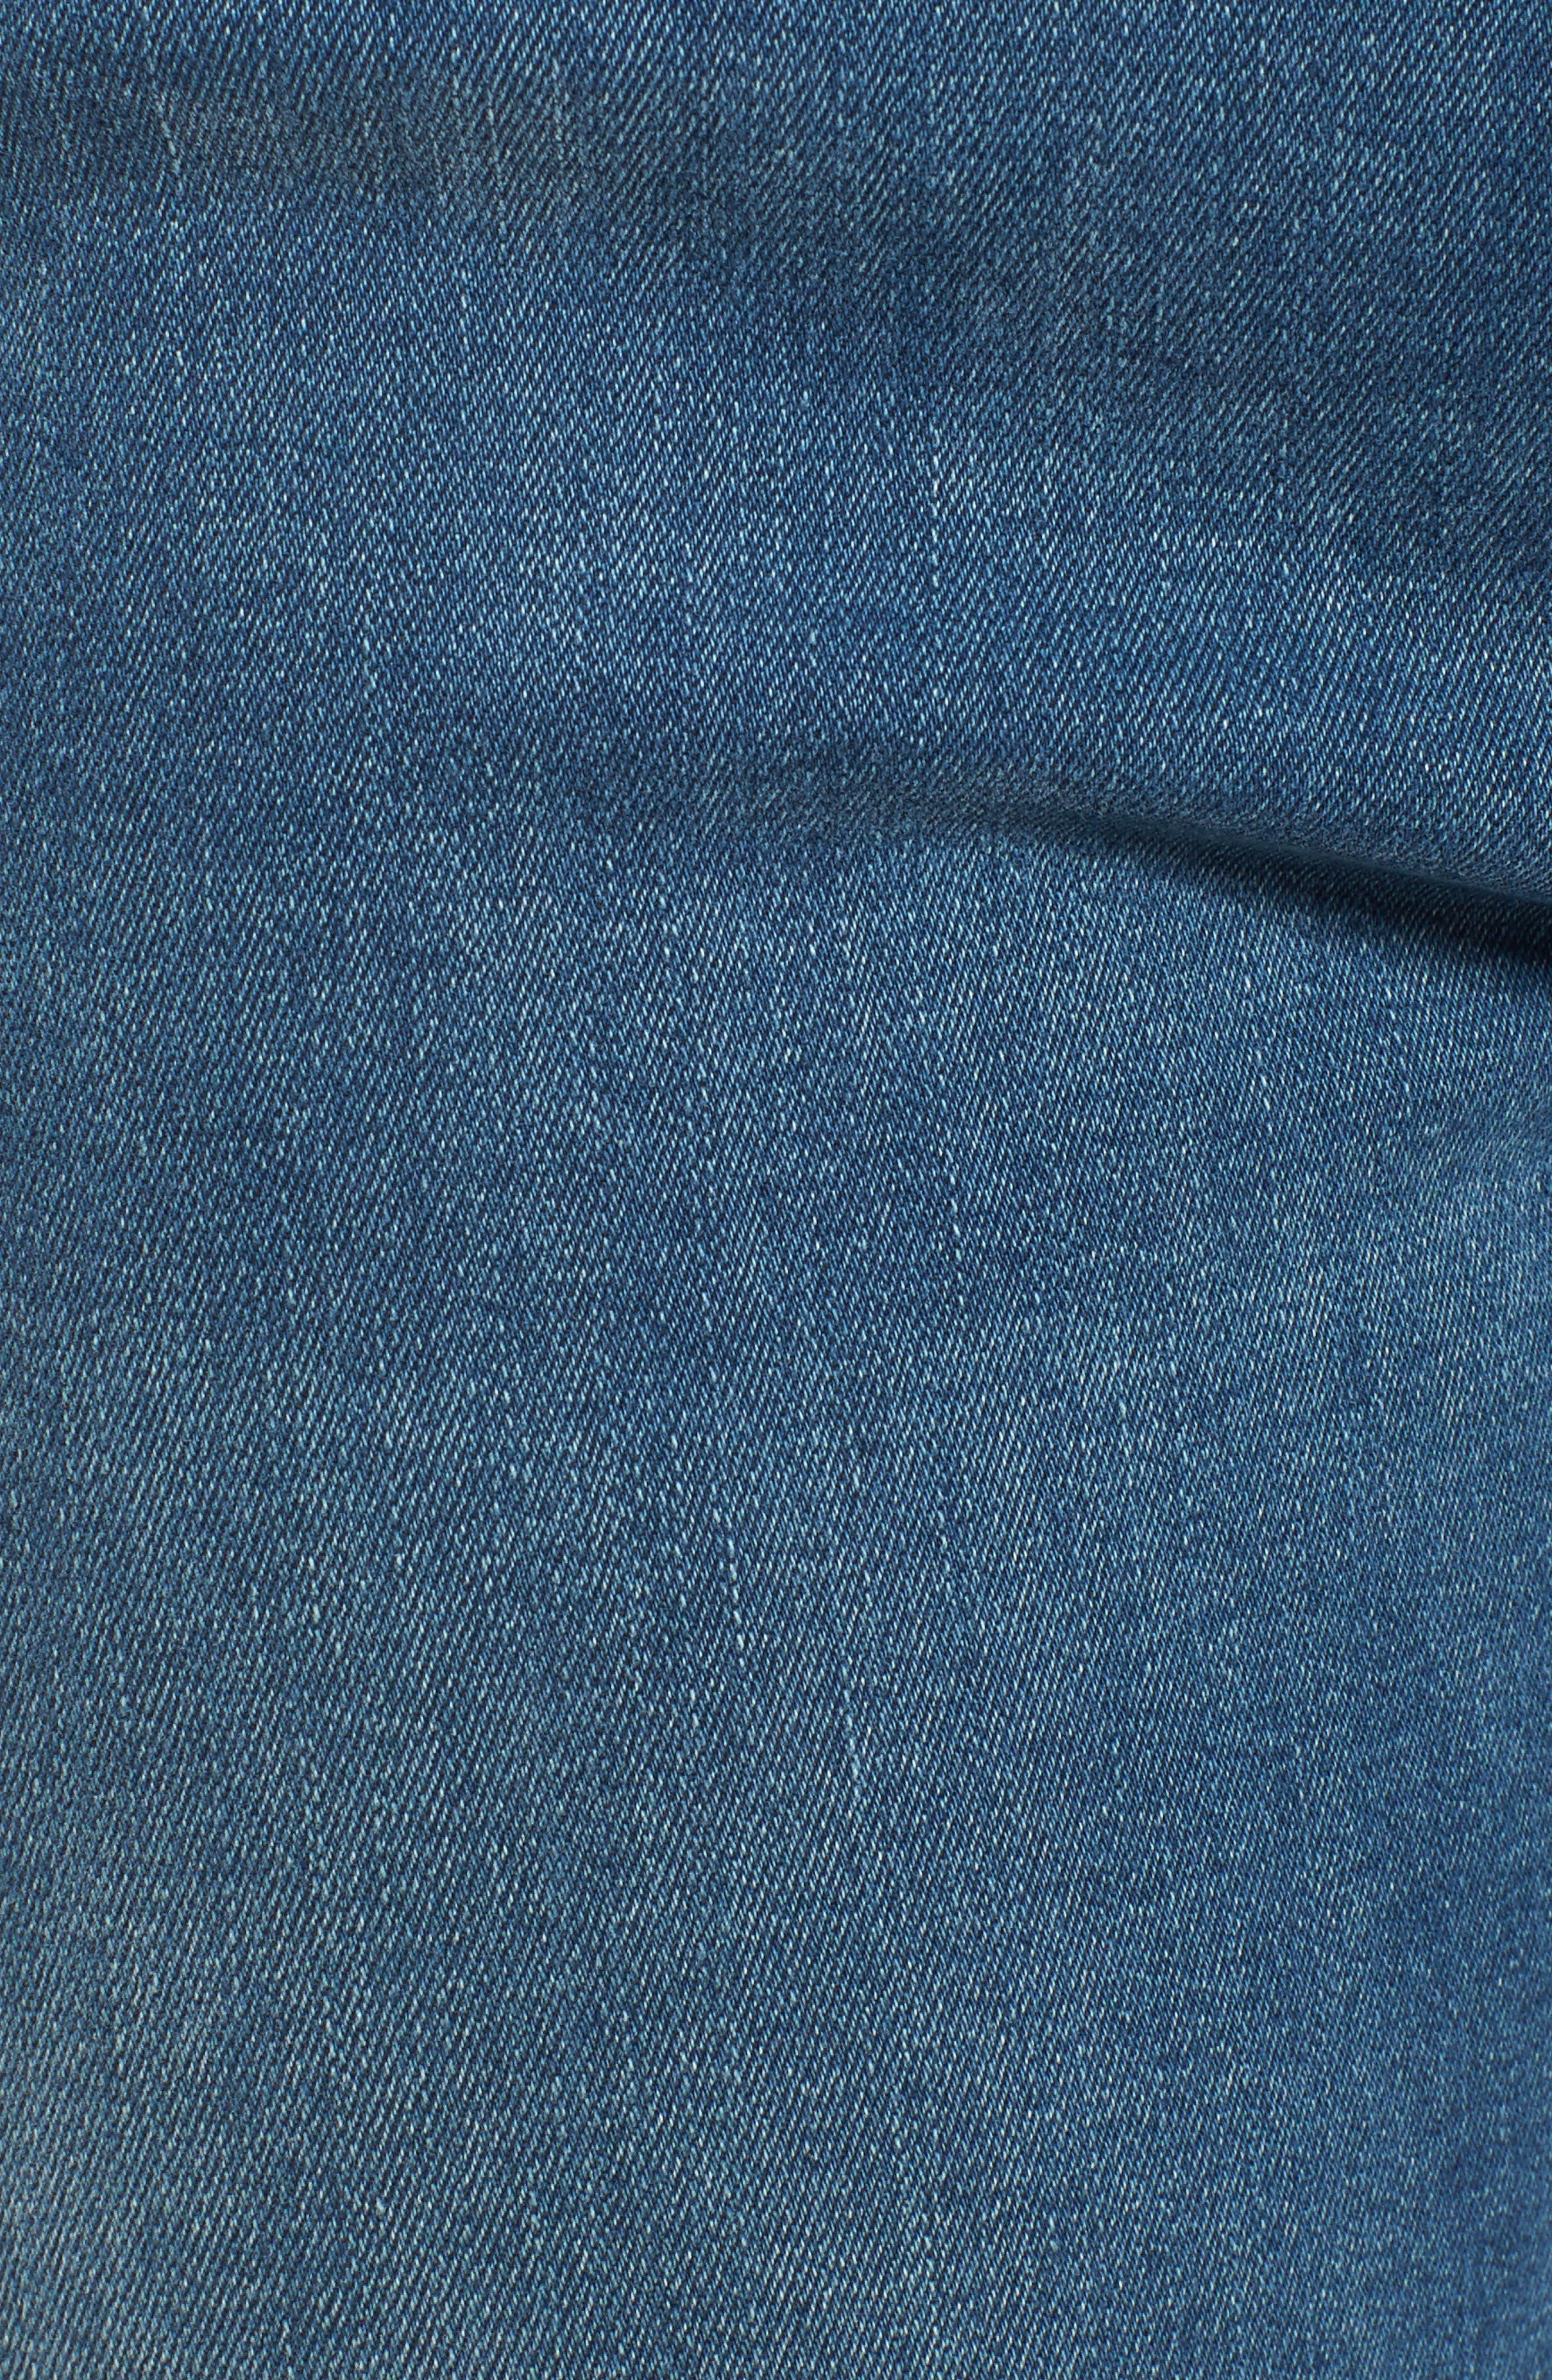 Kendra High Waist Straight Leg Jeans,                             Alternate thumbnail 5, color,                             420